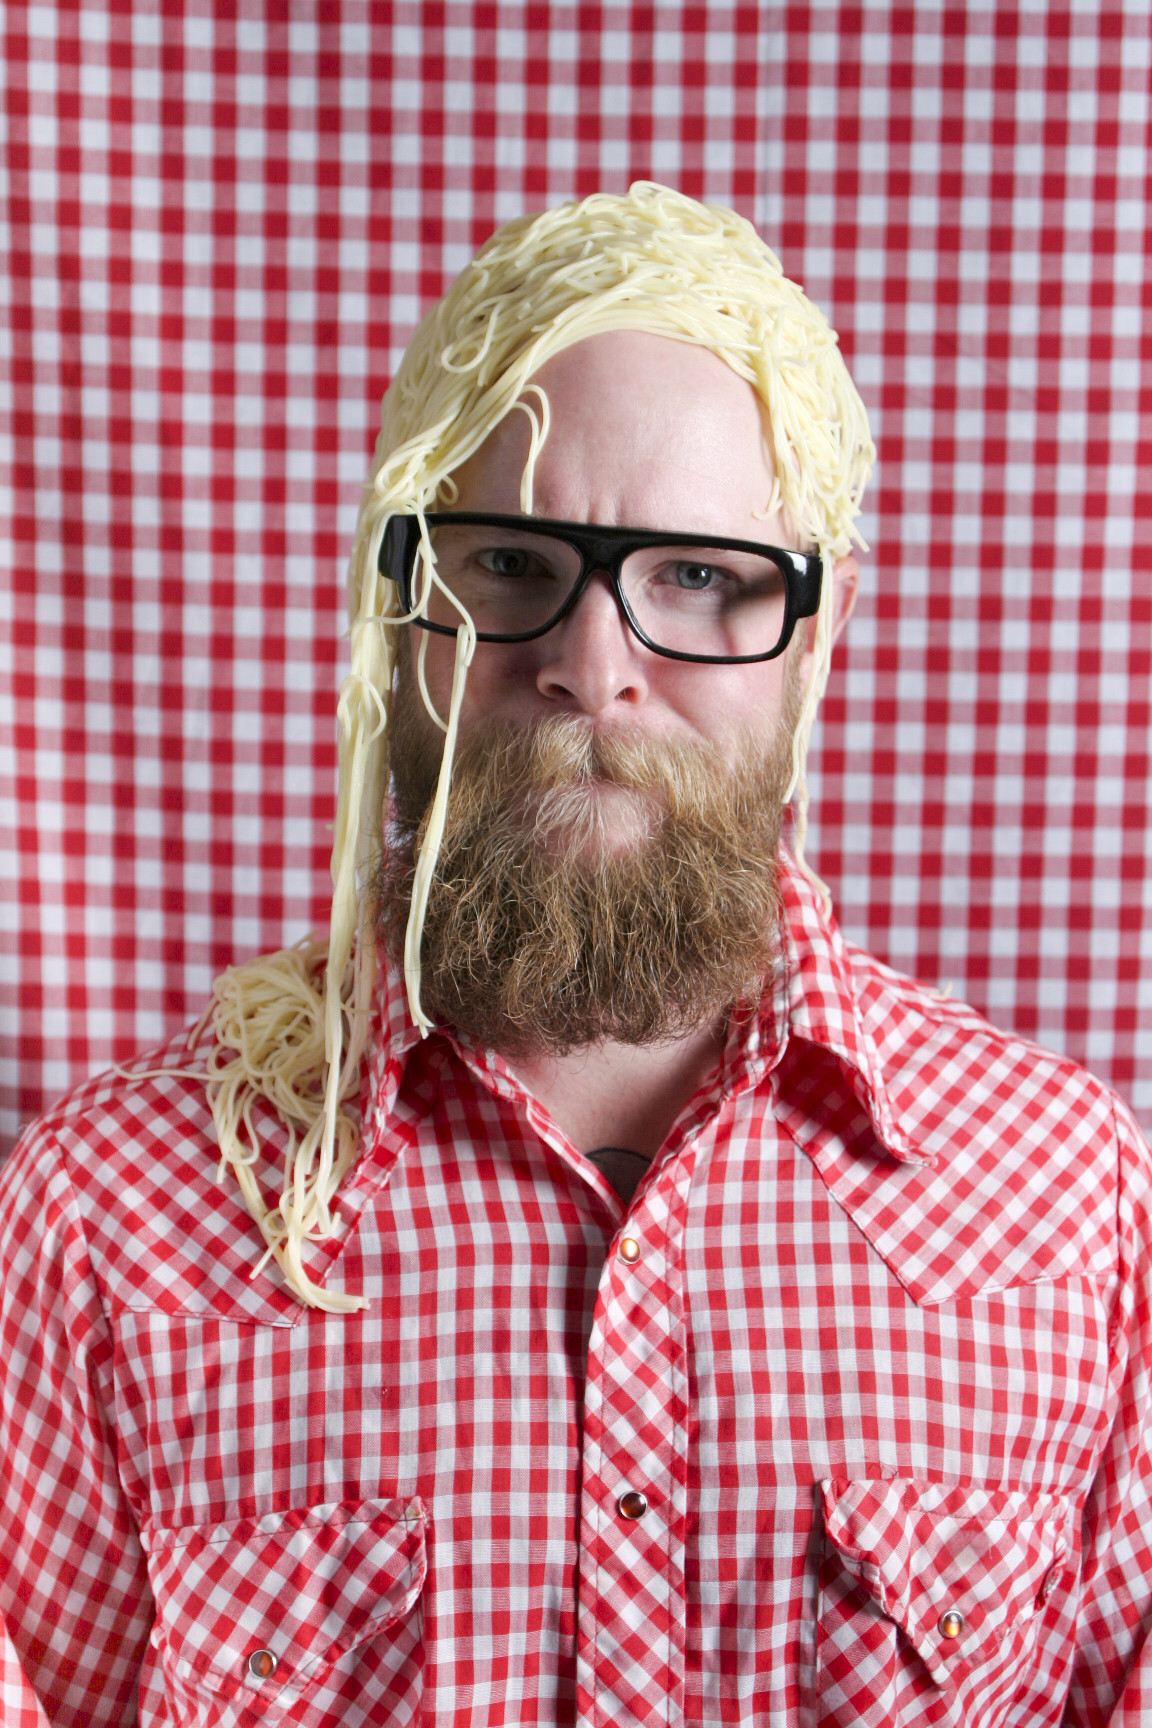 Spaghetti wig